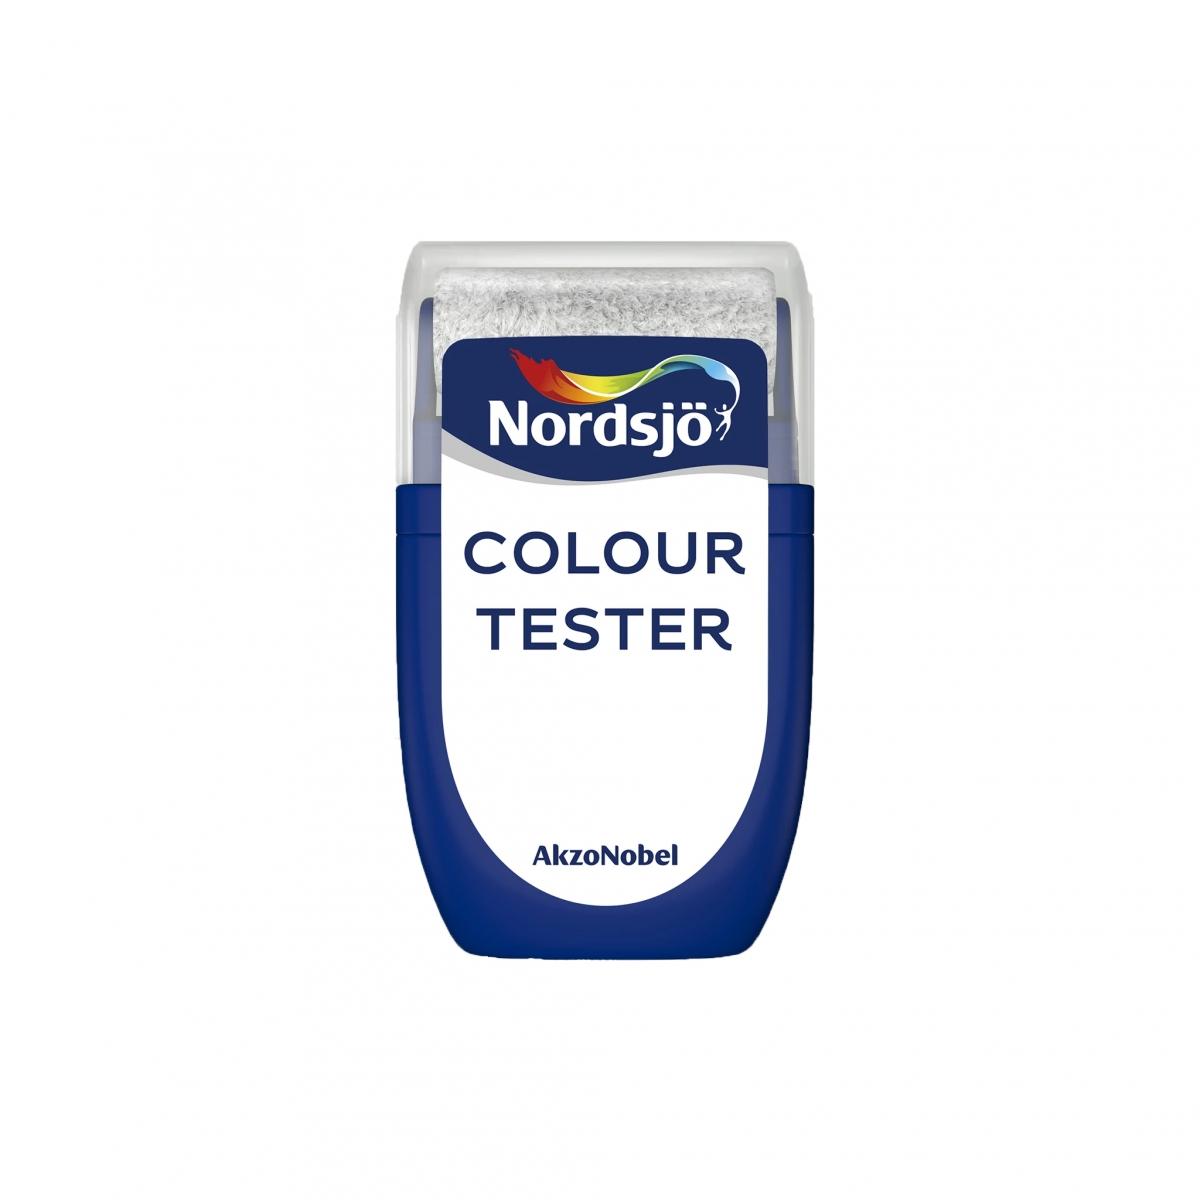 Nordsjö colour tester